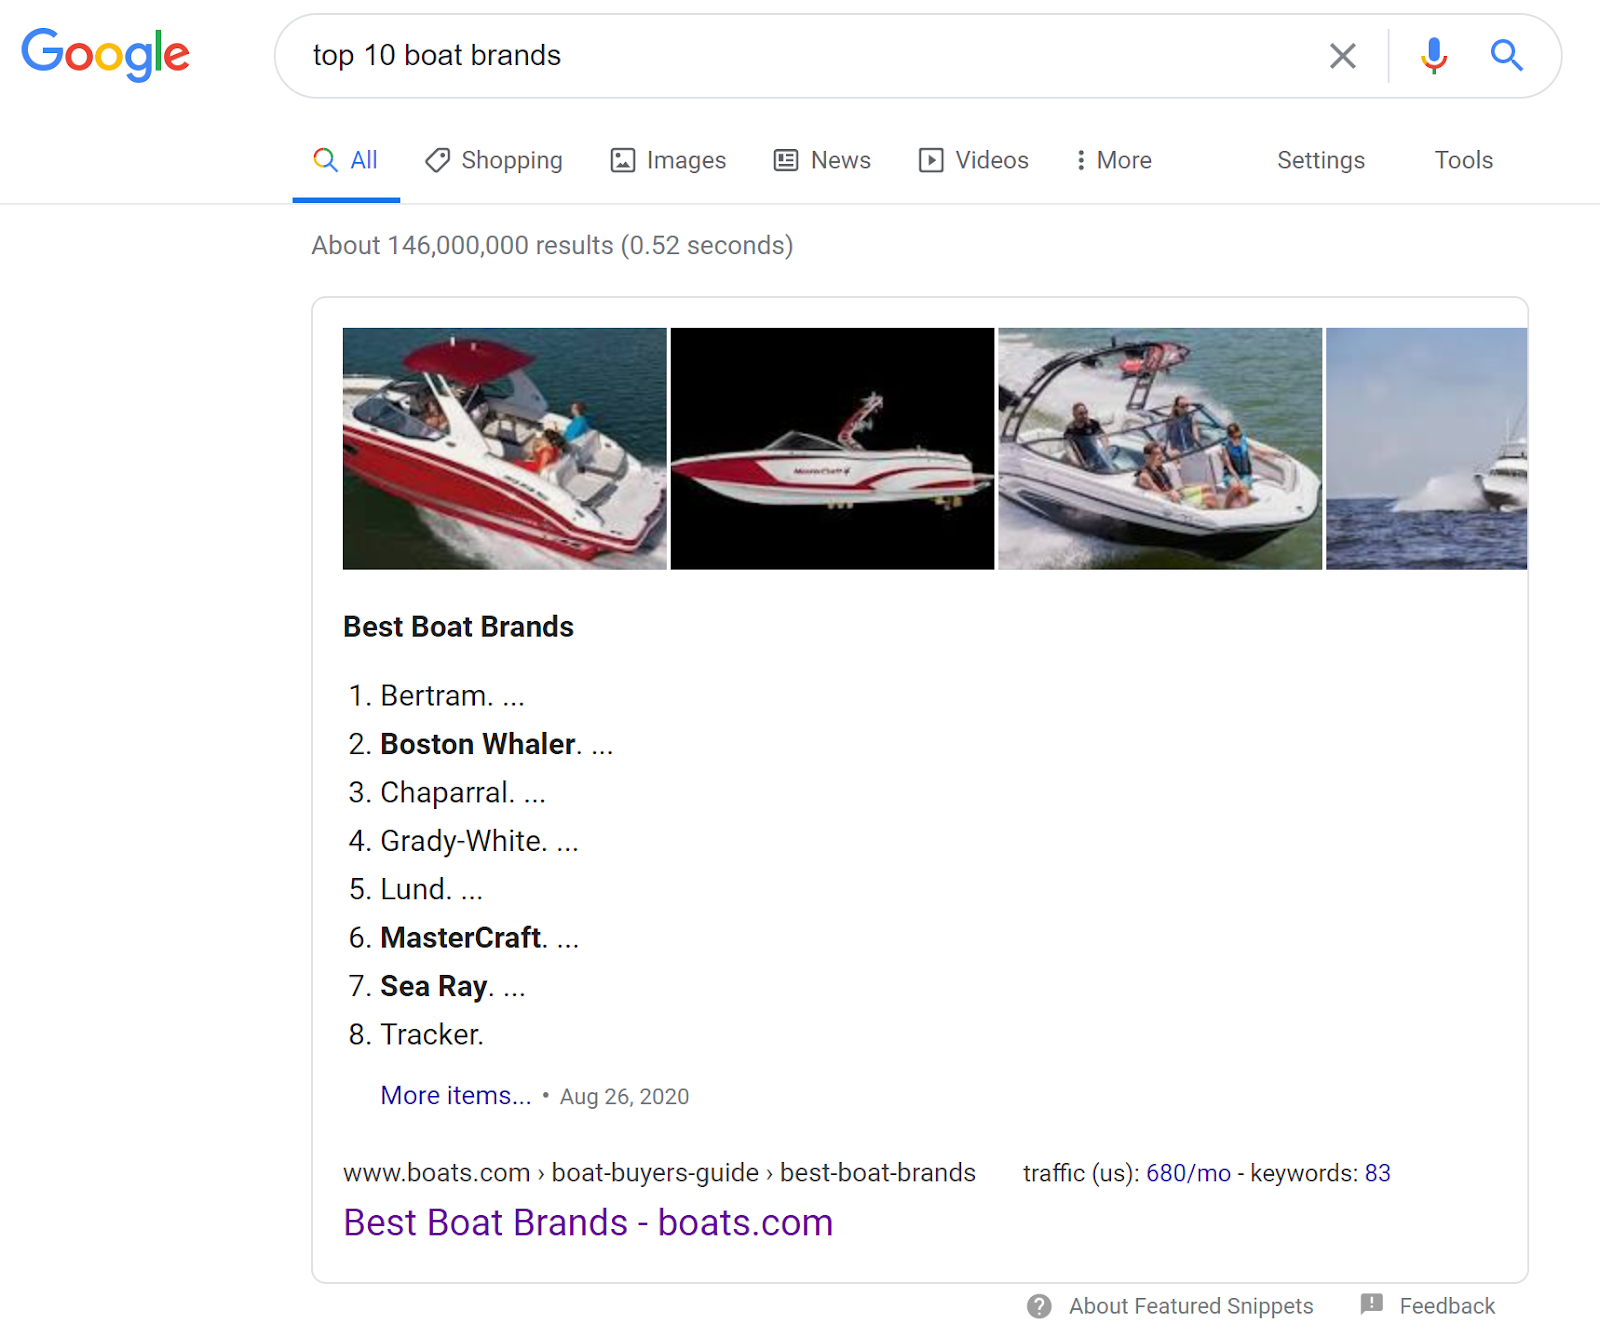 Best Boat Brands Featured Snippet screenshot